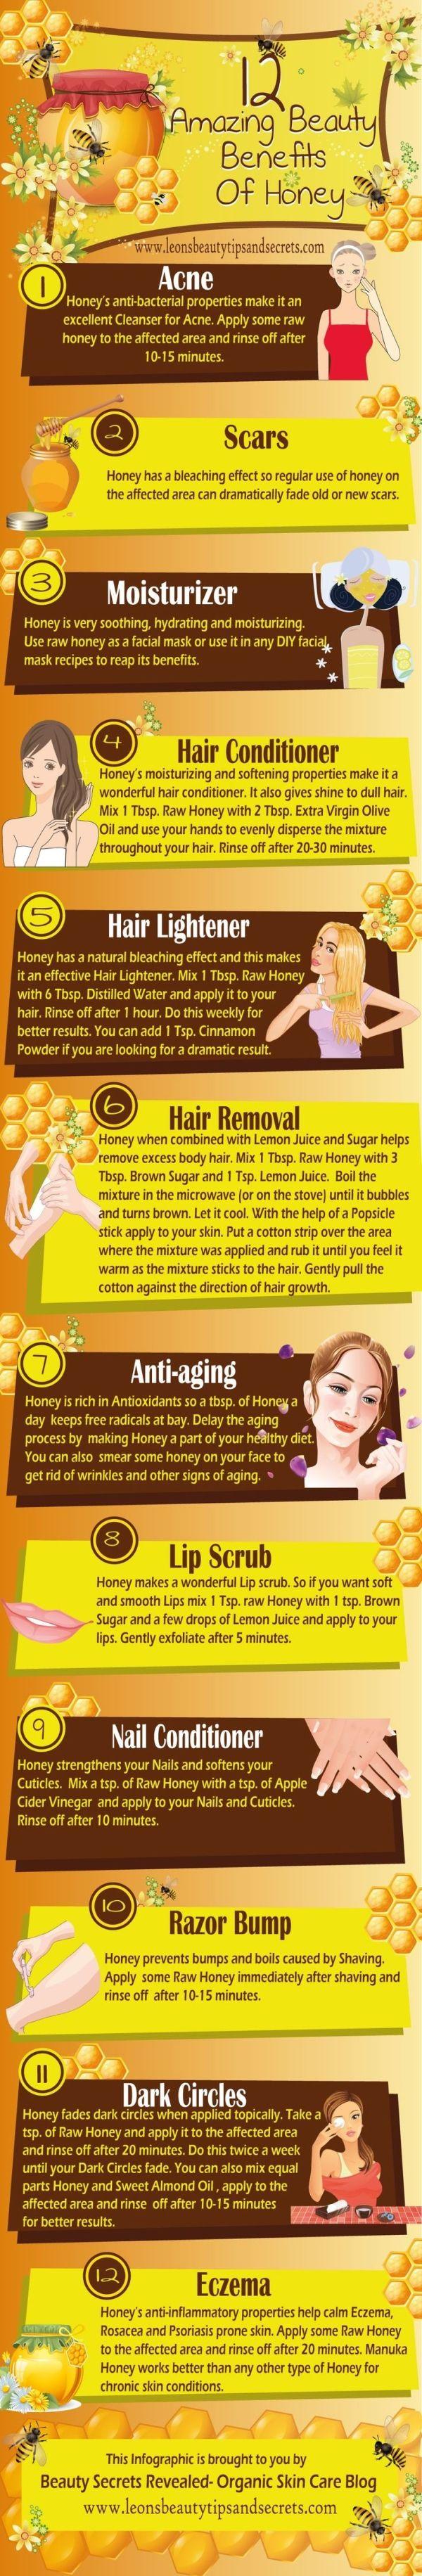 12 Amazing Beauty Benefits Of Honey Honey for eczema, acne, hair, wrinkles, scars, dark circles by echkbet